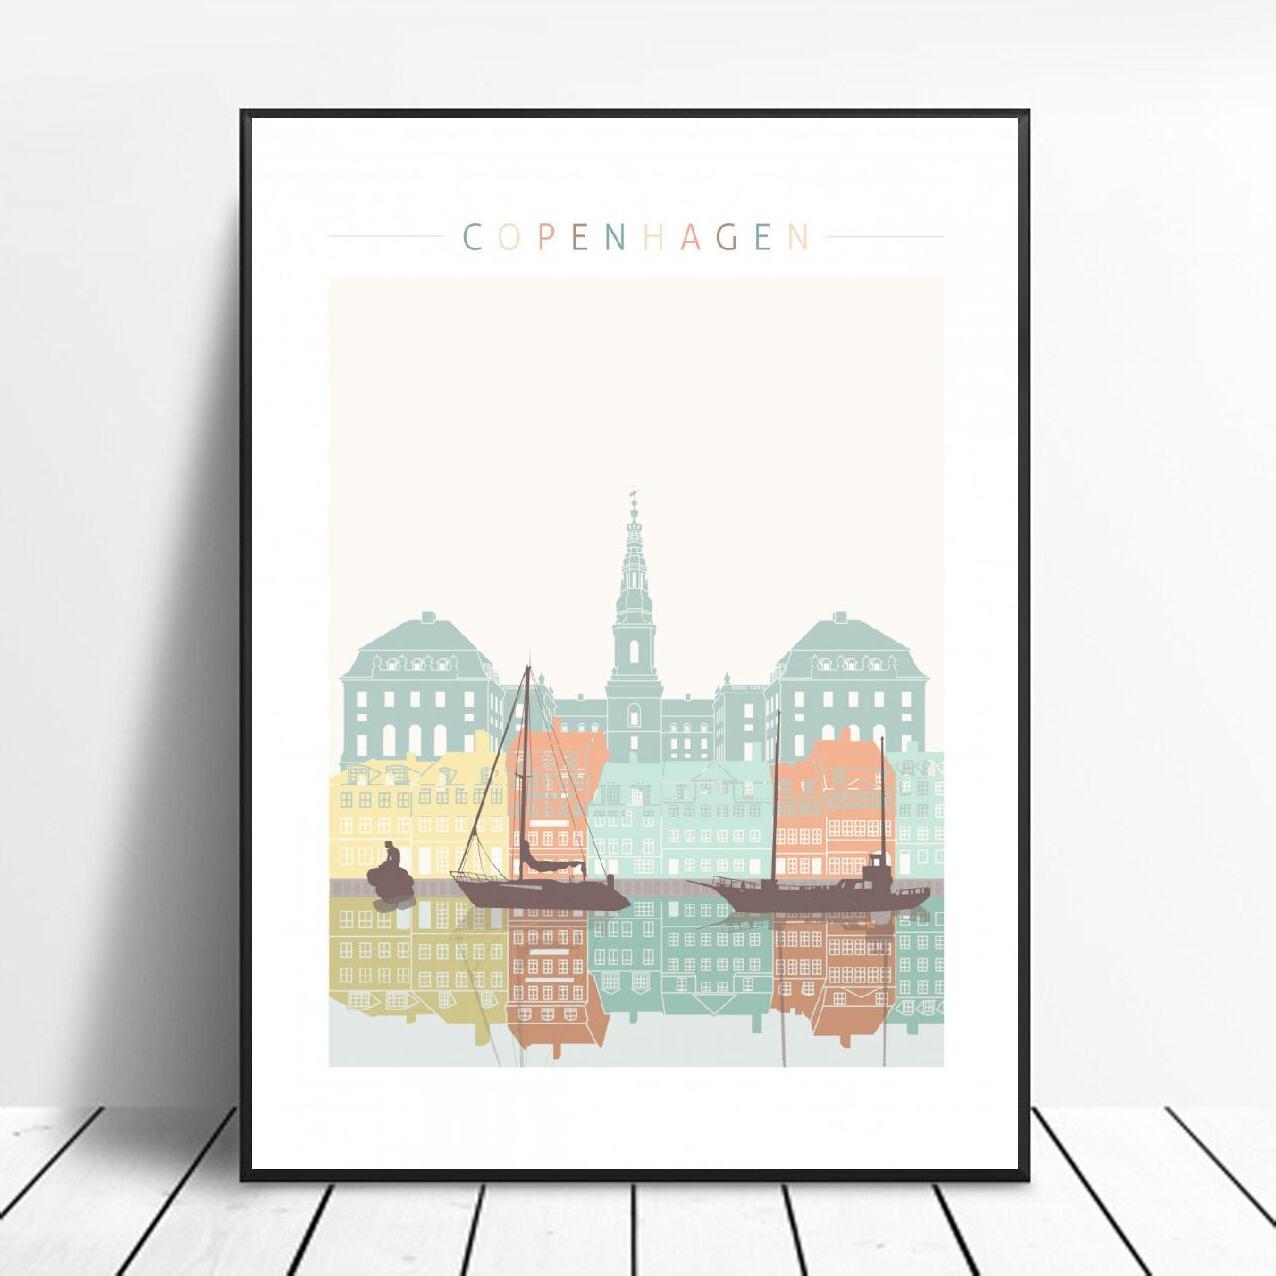 Copenhagen Skyline Canvas Print Wall Art Poster Picture Modern Minimalist Bedroom Living Room Decoration No Frame